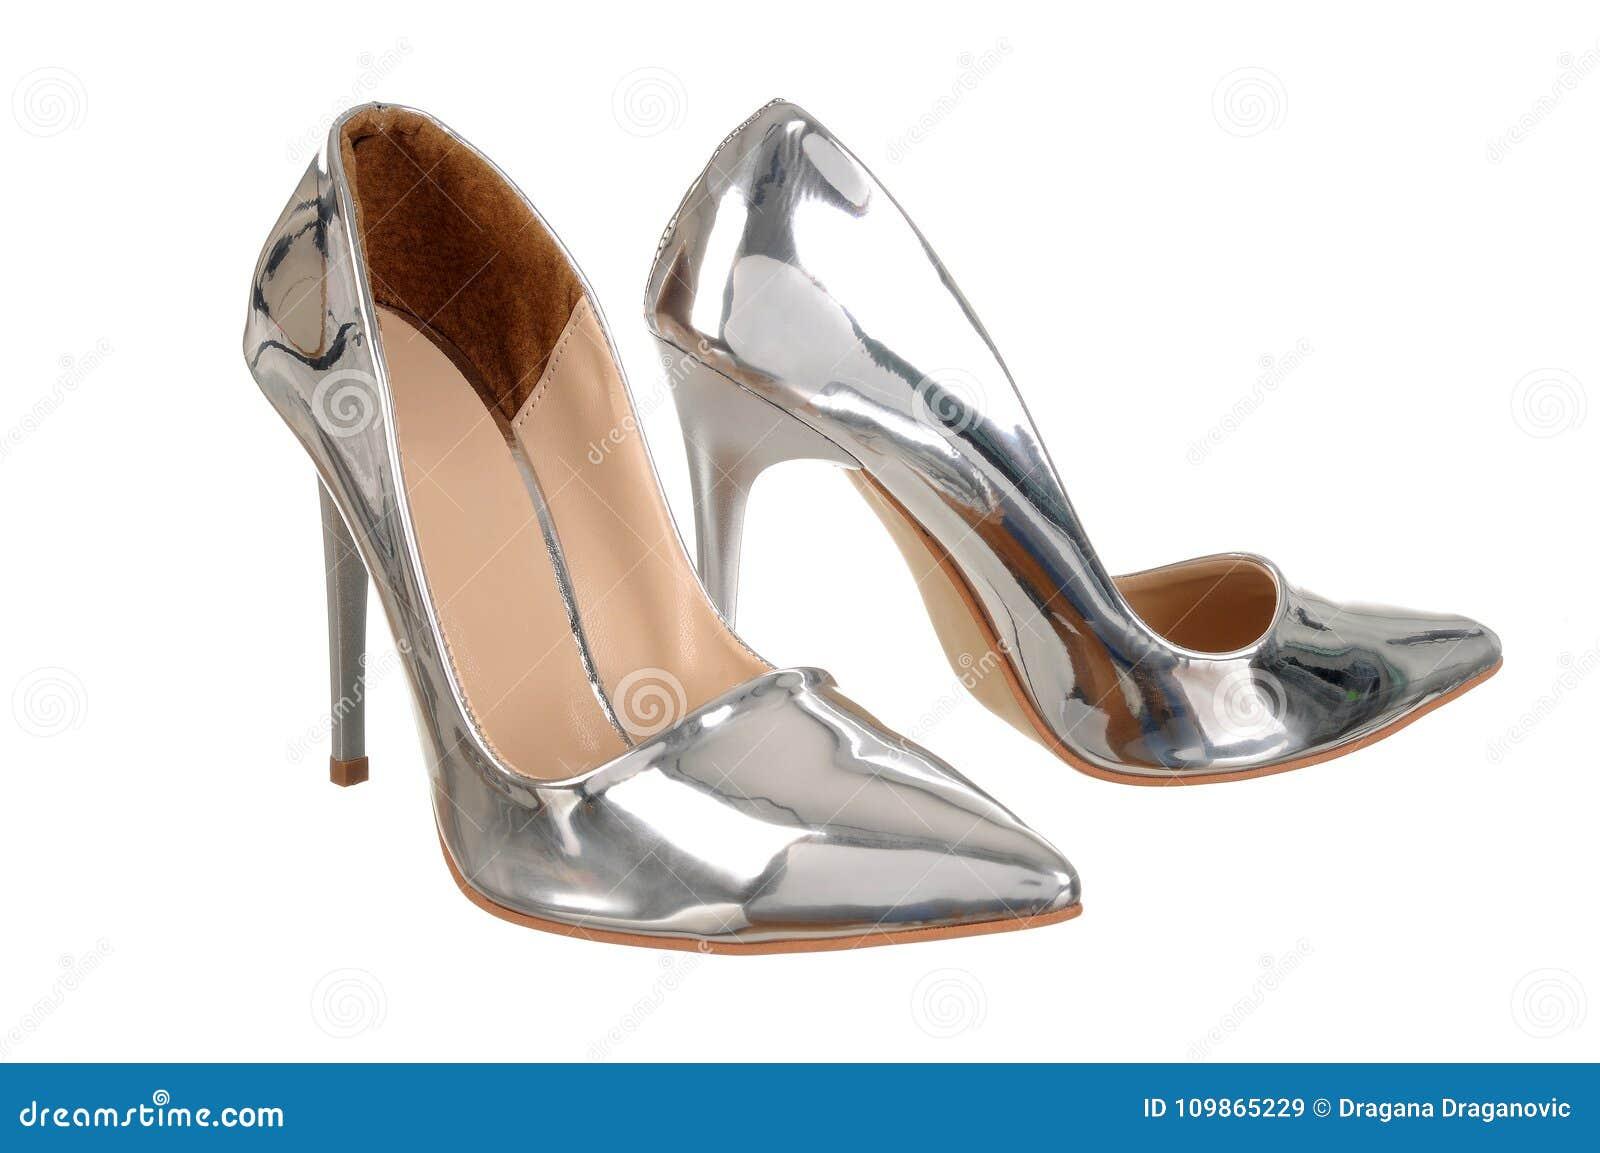 c256368bf0b Ασημένια υψηλά παπούτσια γυναικών τακουνιών Στοκ Εικόνα - εικόνα από ...